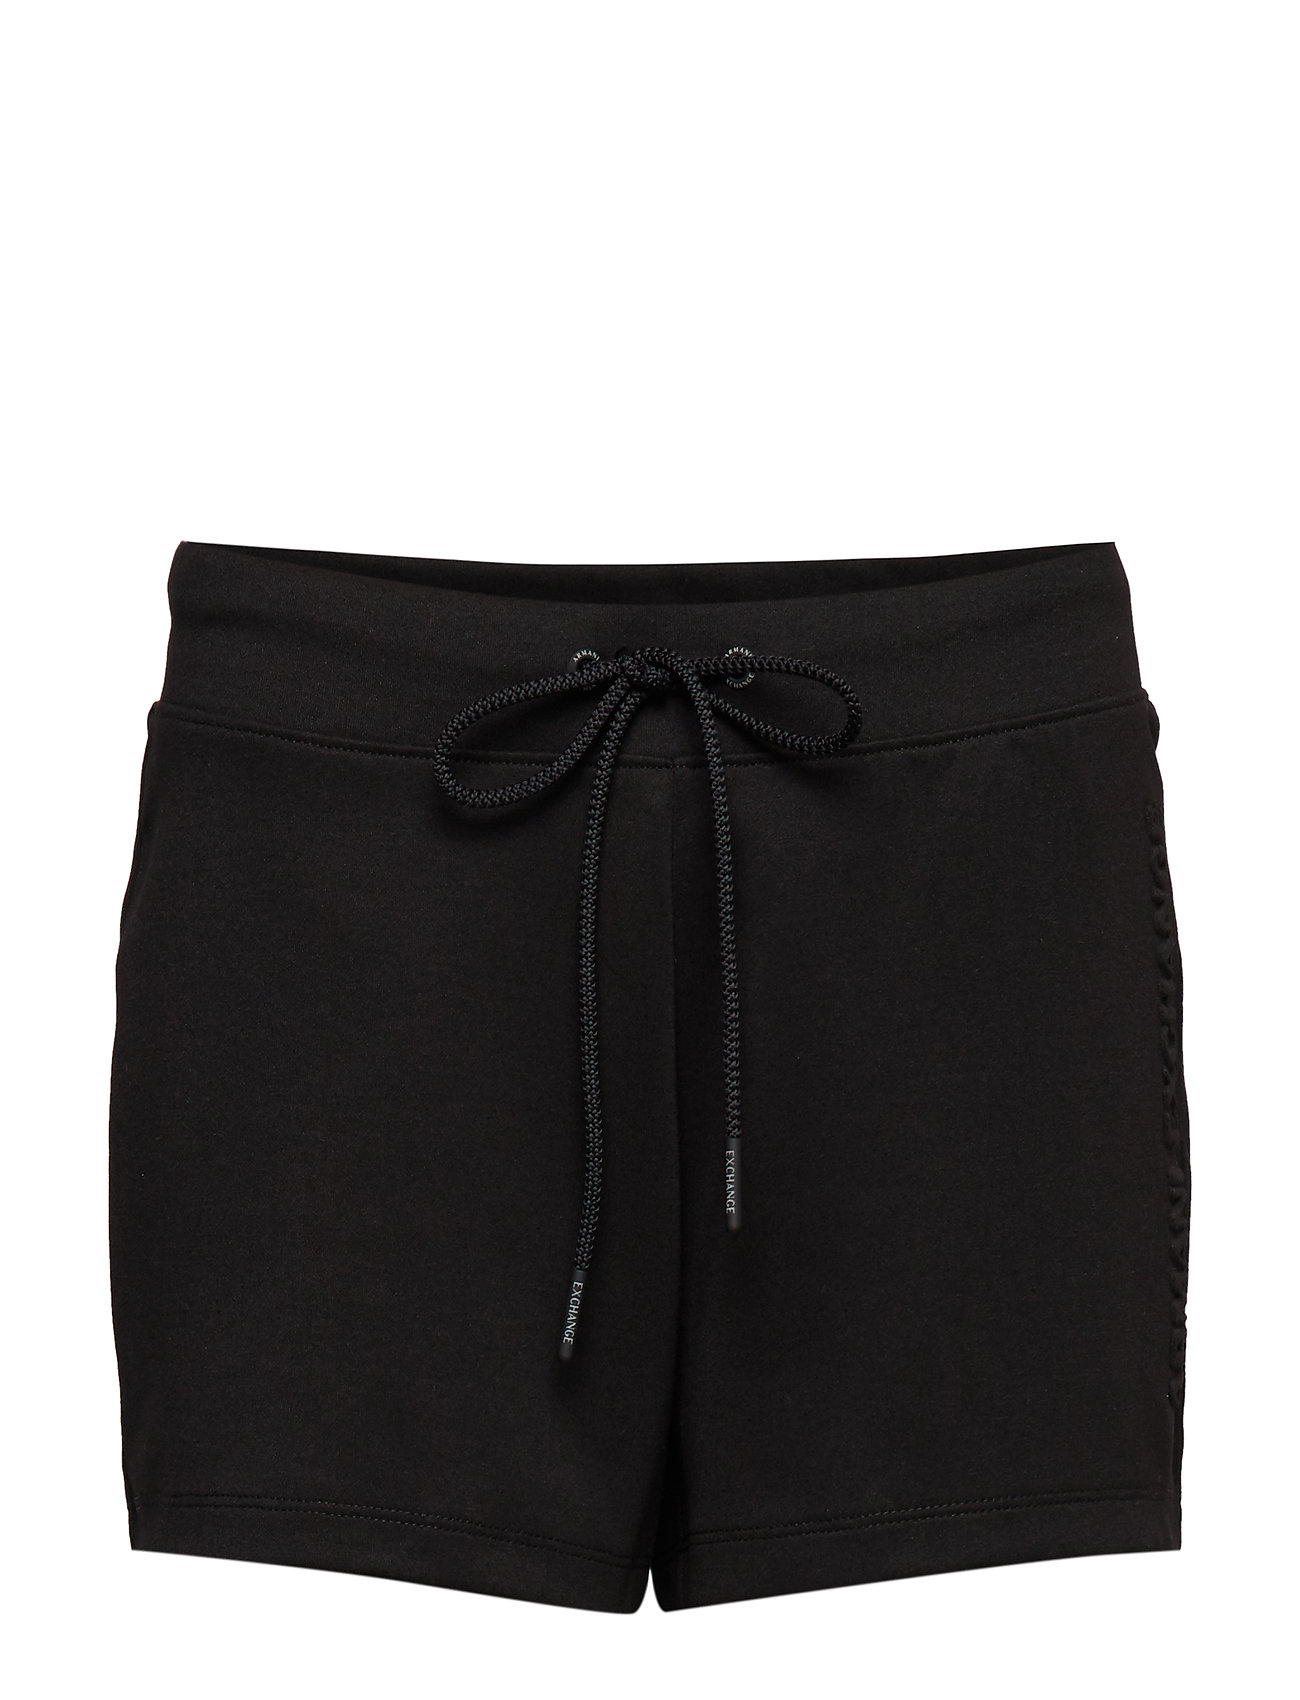 Armani Exchange WOMAN JERSEY SHORTS Shorts